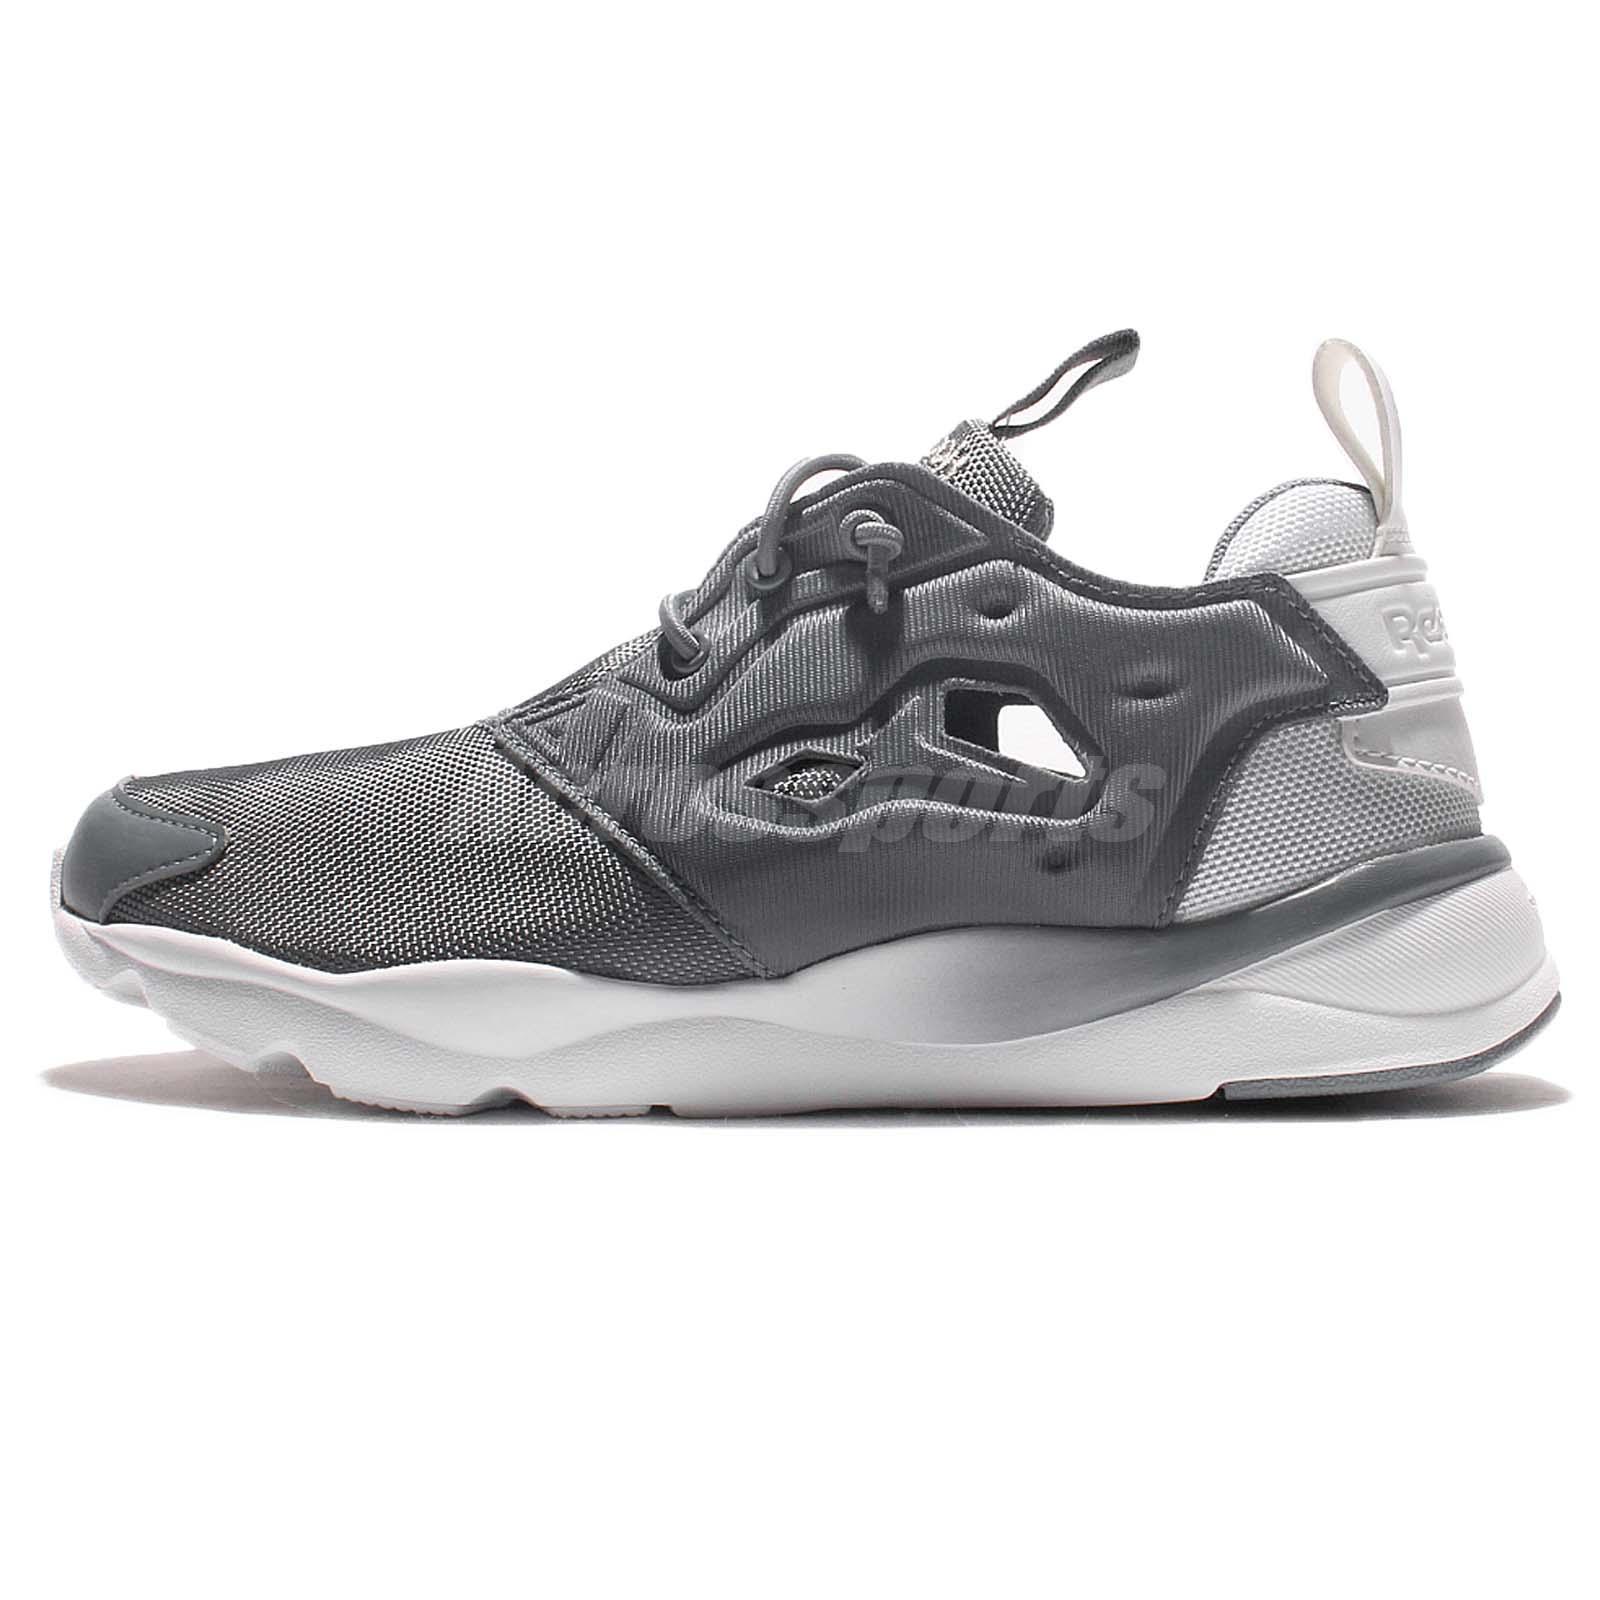 4fa4cc789c1678 ... Reebok Furylite Clean Asteroid Dust Grey White Women Casual Shoe  Sneakers BD1436 ...